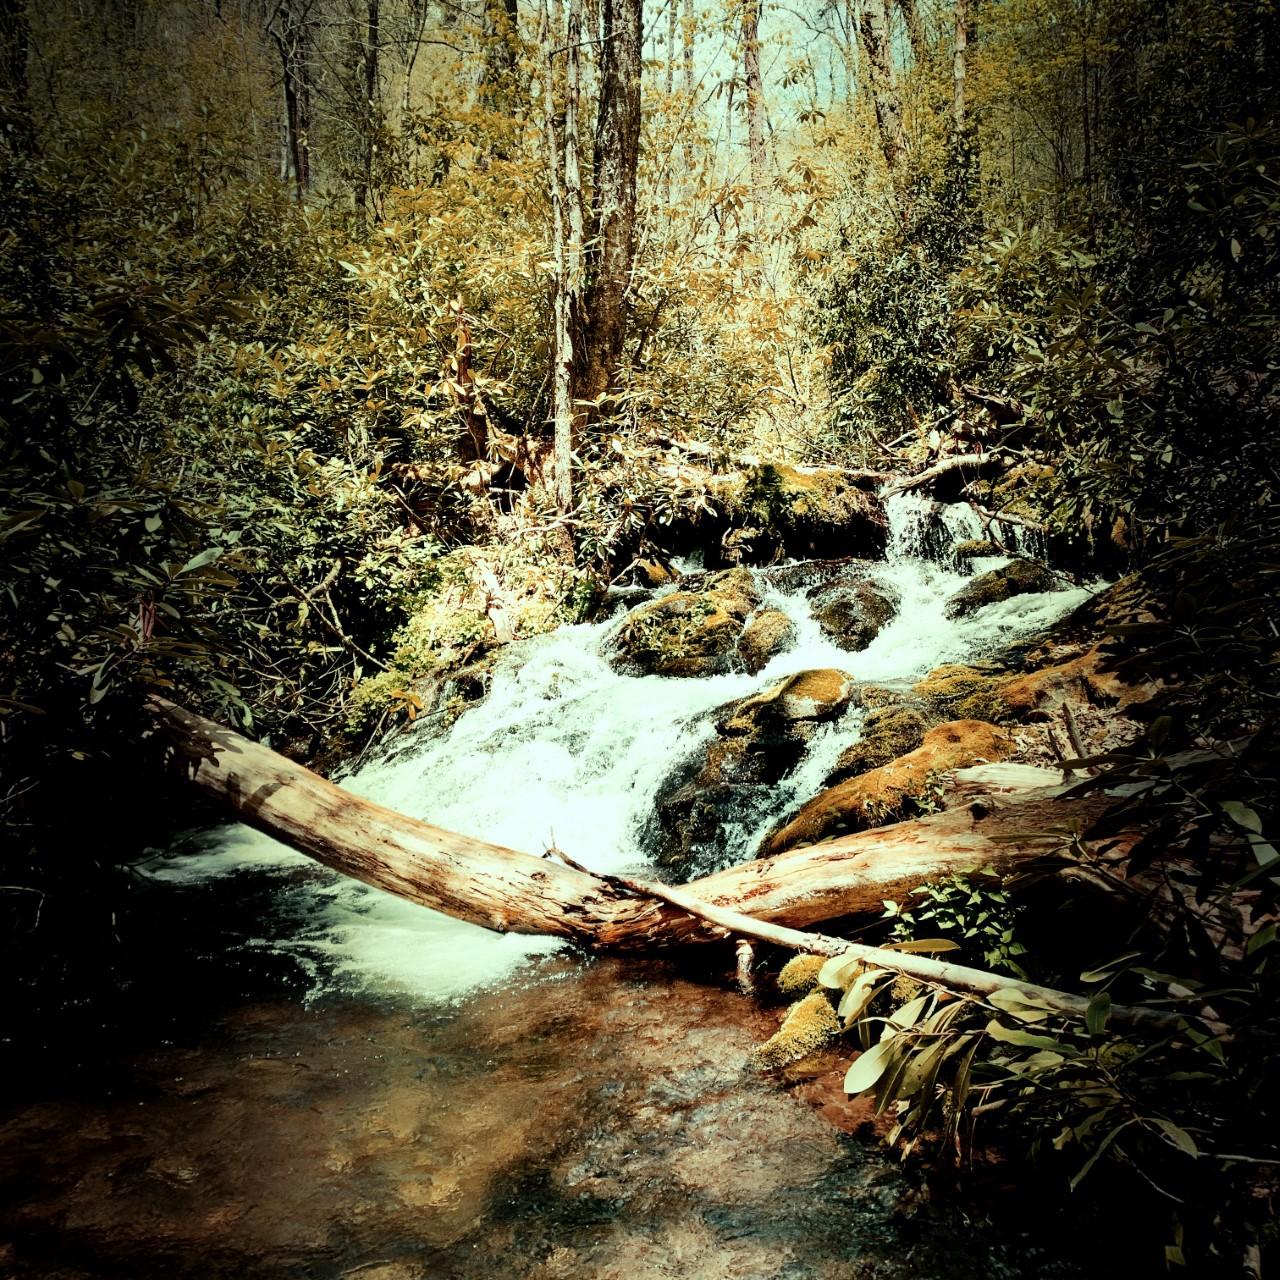 Pretty Hollow Gap Trail - Pretty Hollow Creek